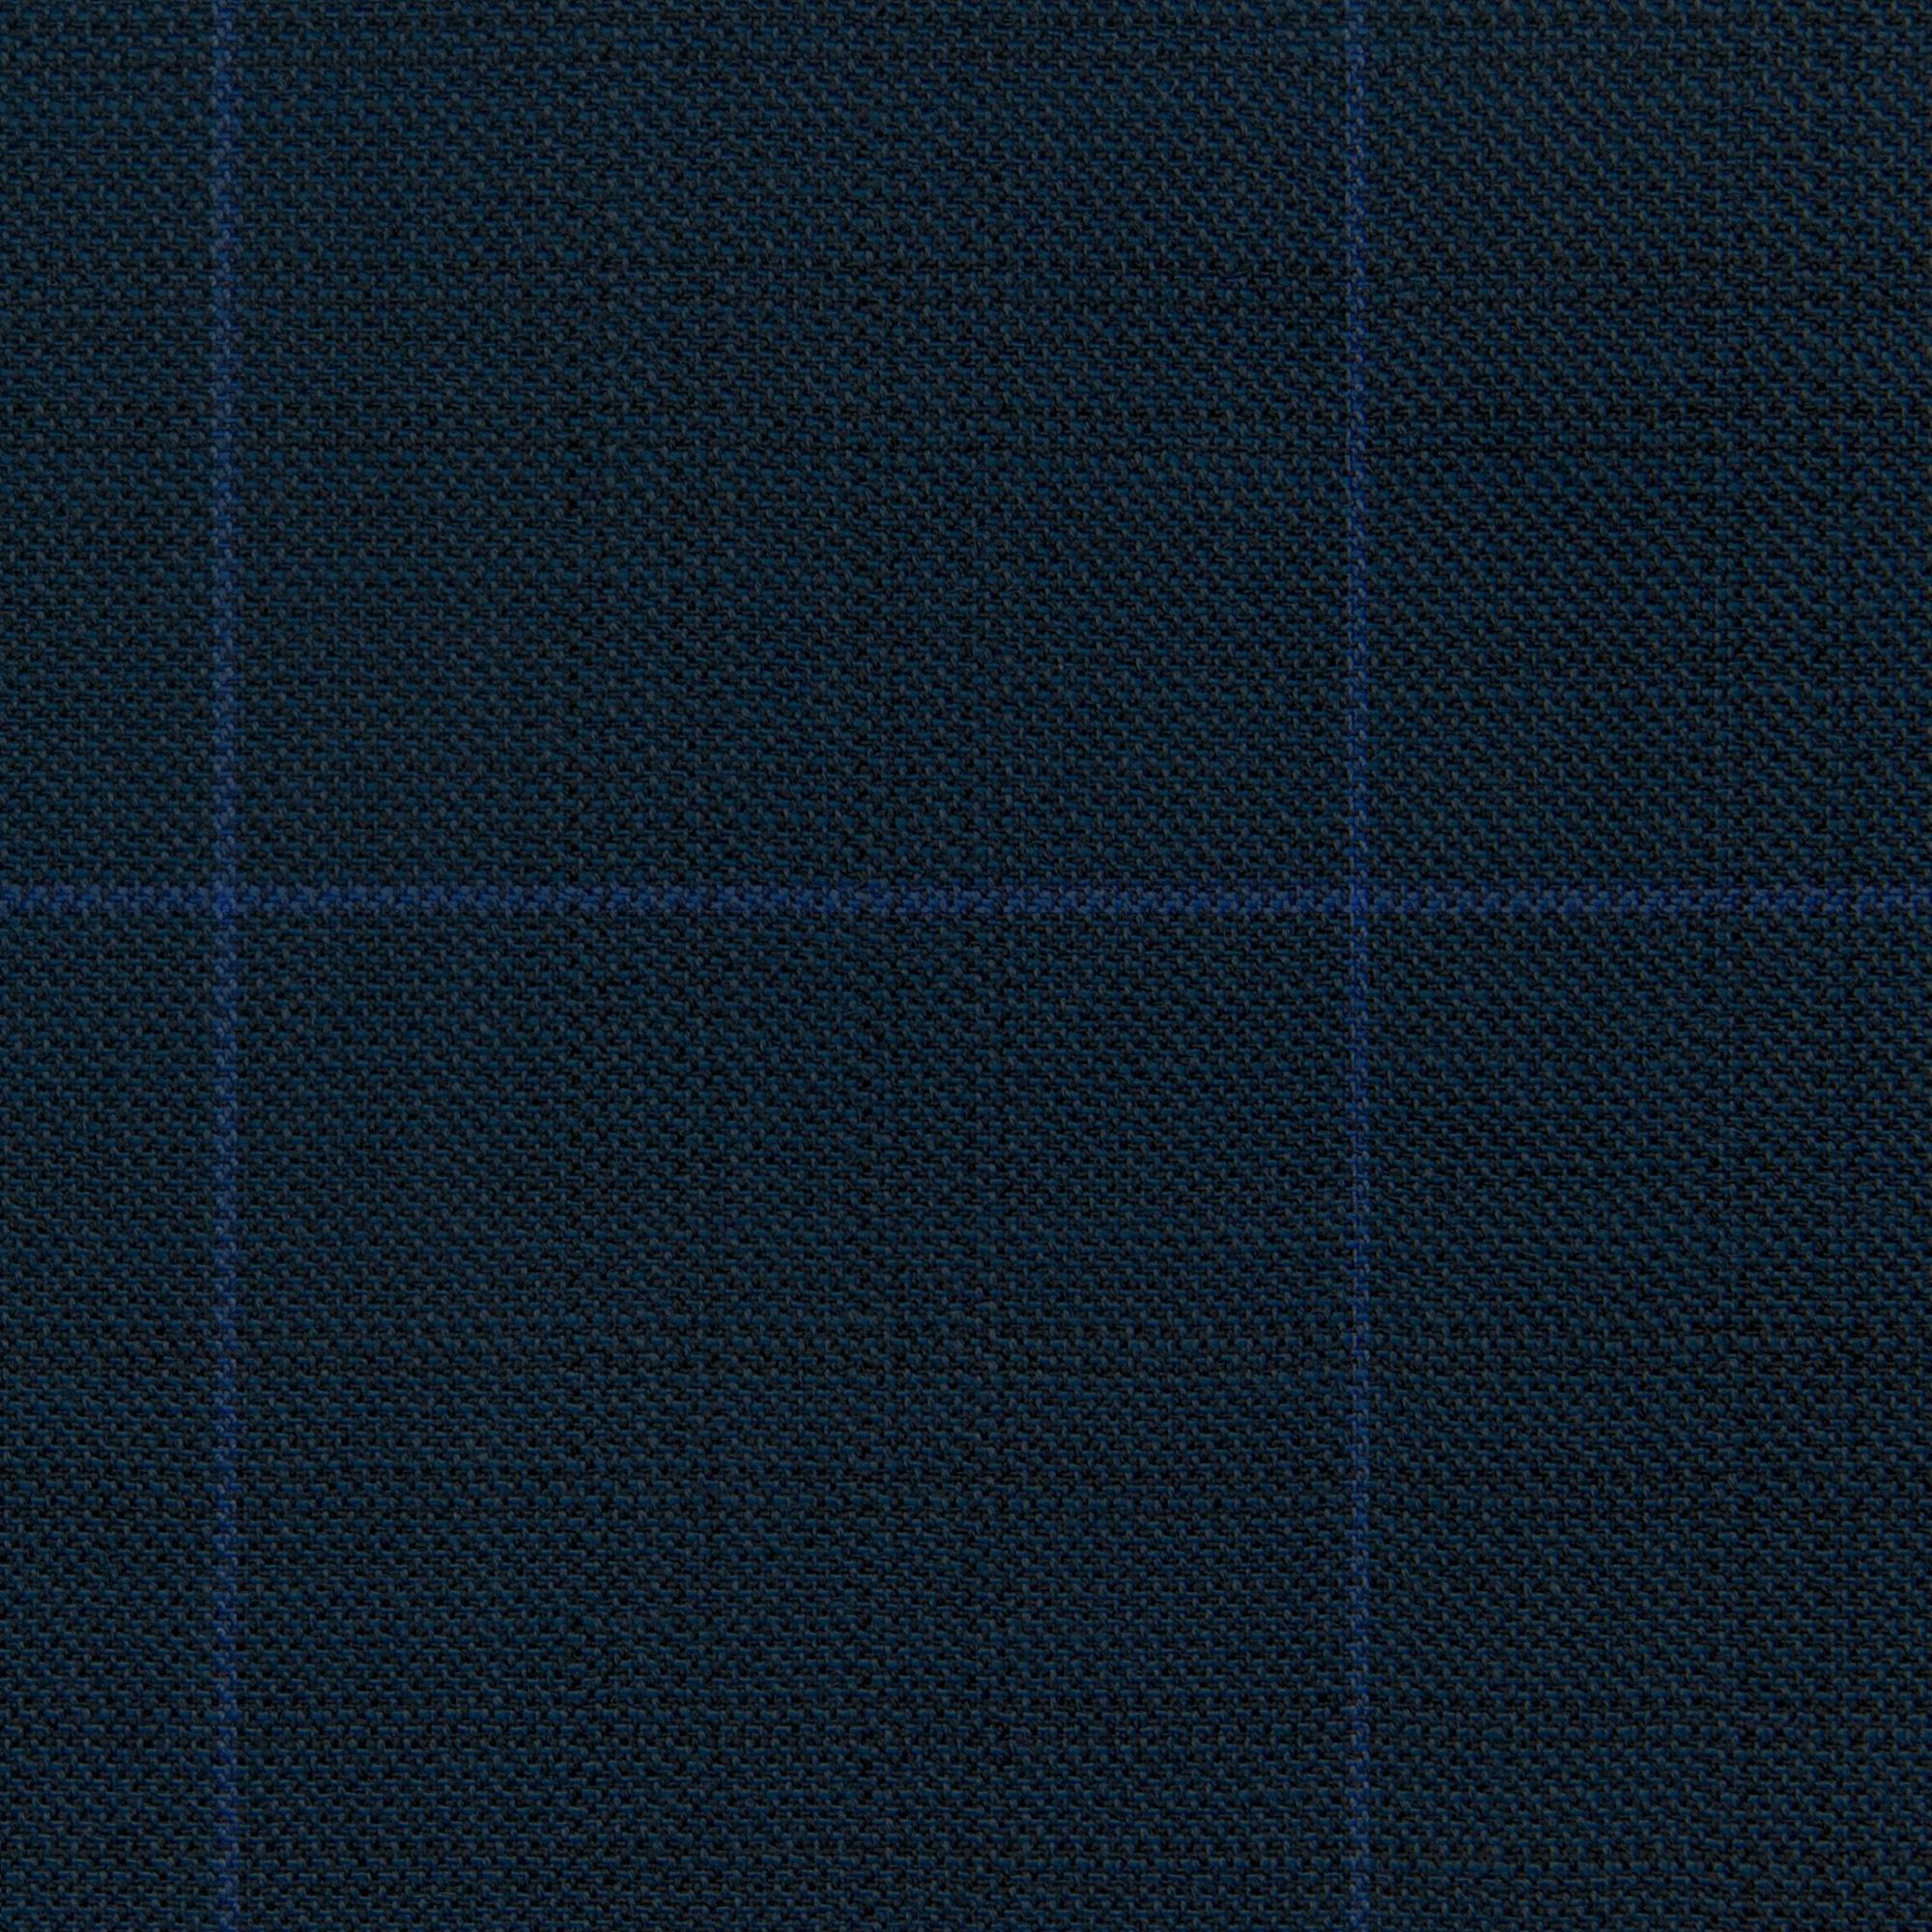 Sz062195 1